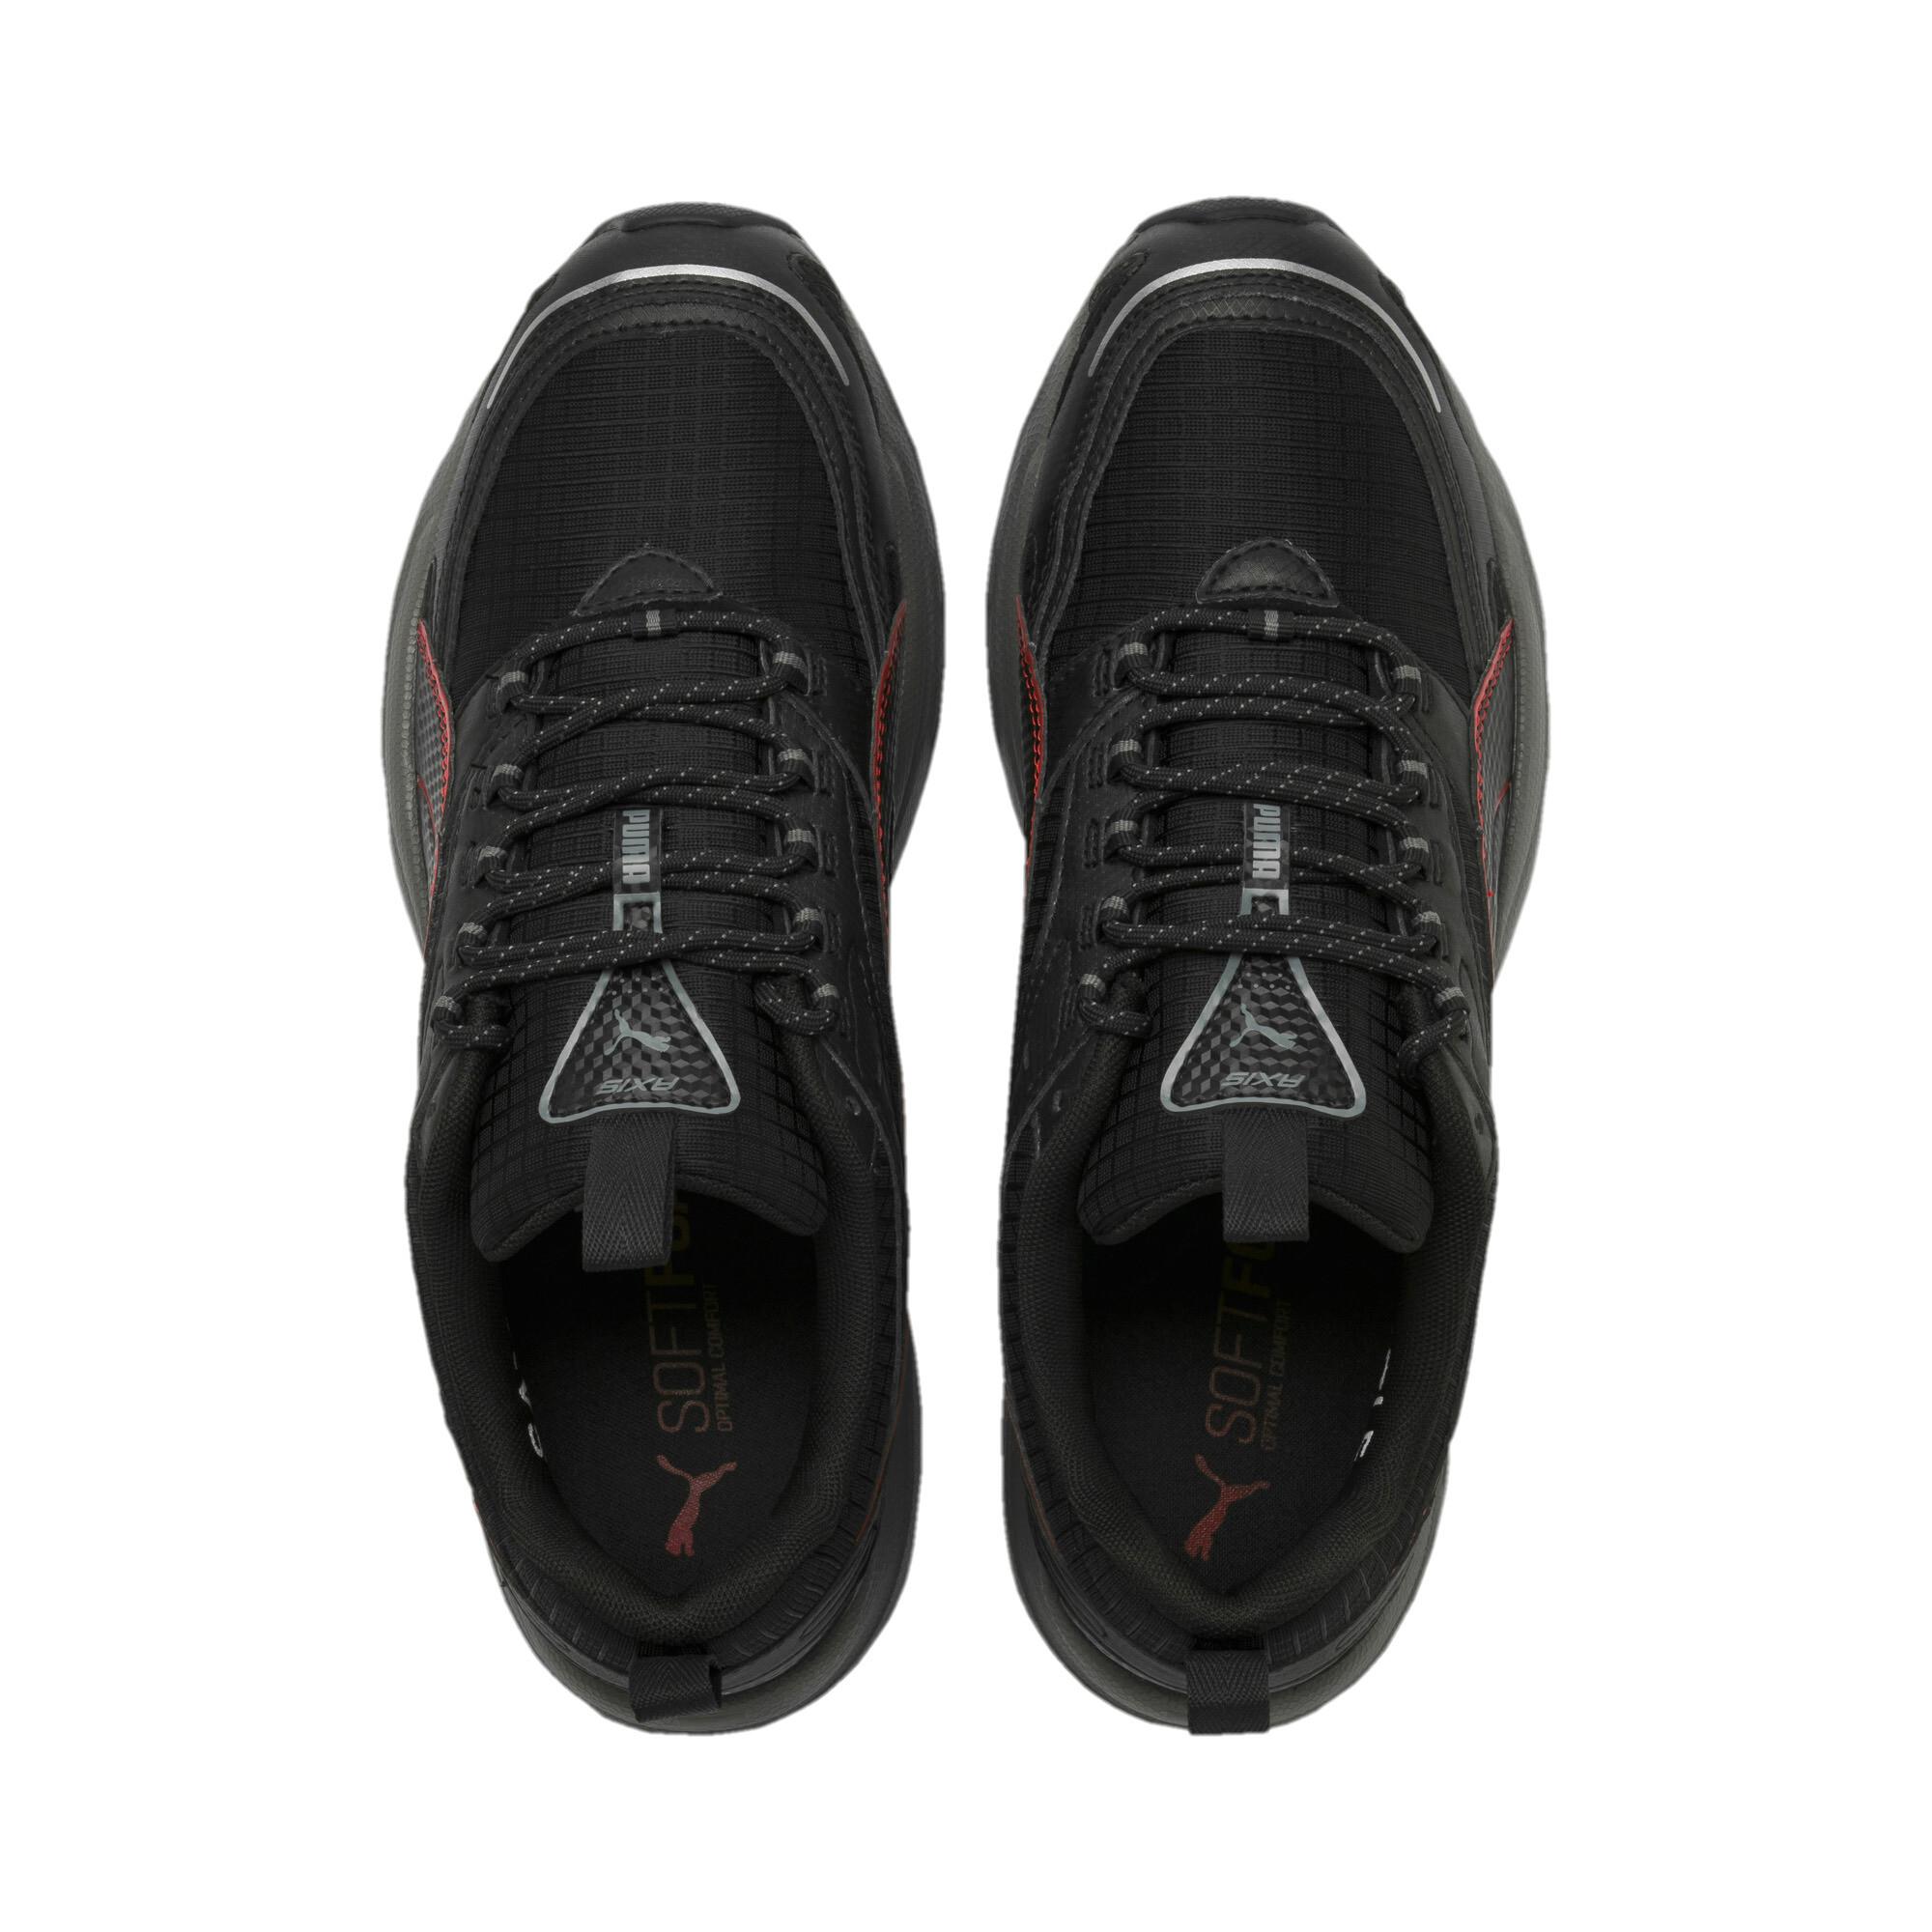 PUMA-Axis-Trail-Sneakers-Men-Shoe-Basics miniature 15